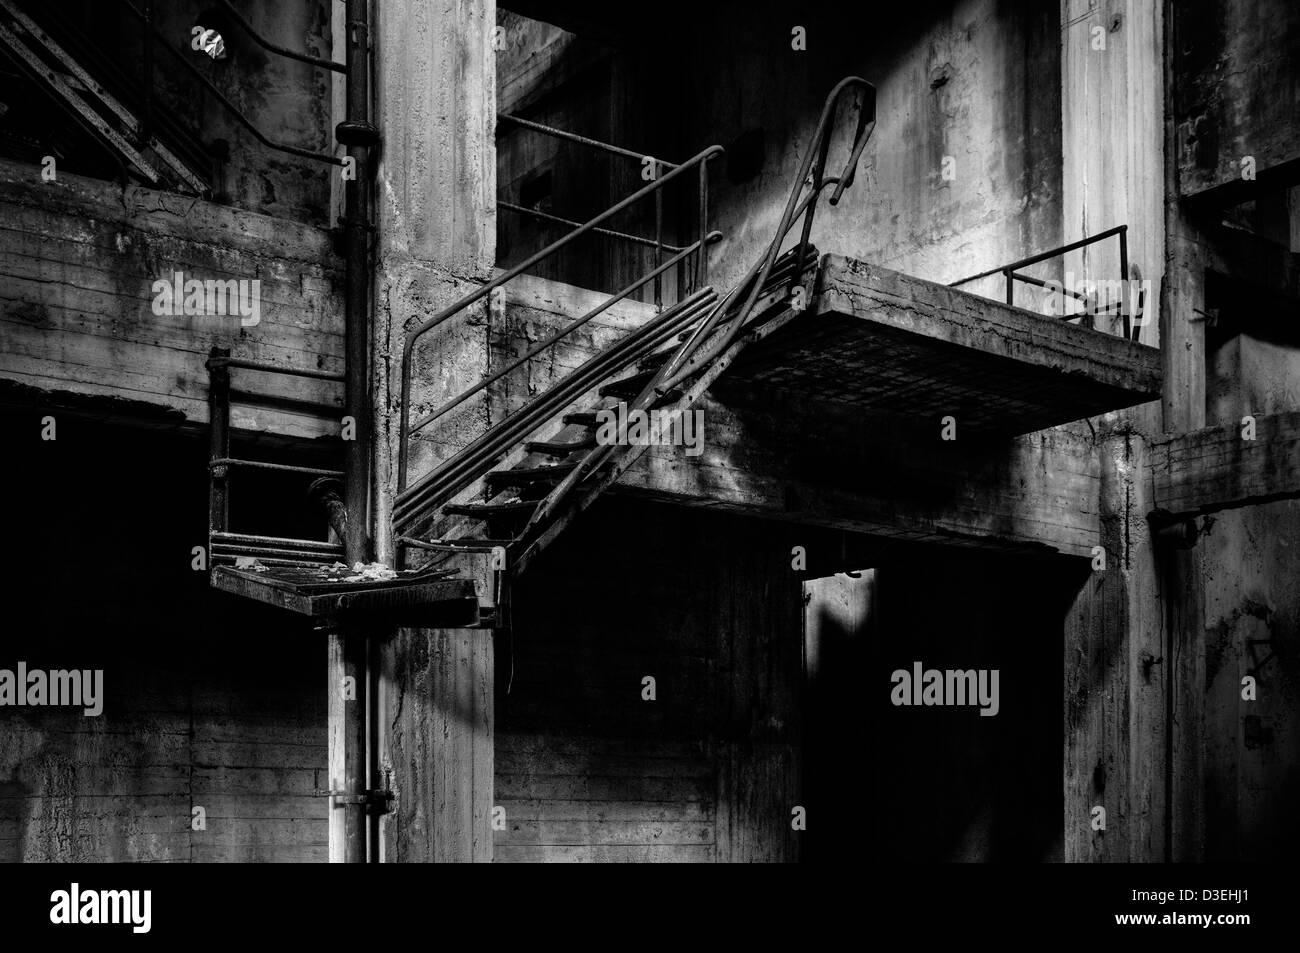 Abandoned factory. Ladder - Stock Image